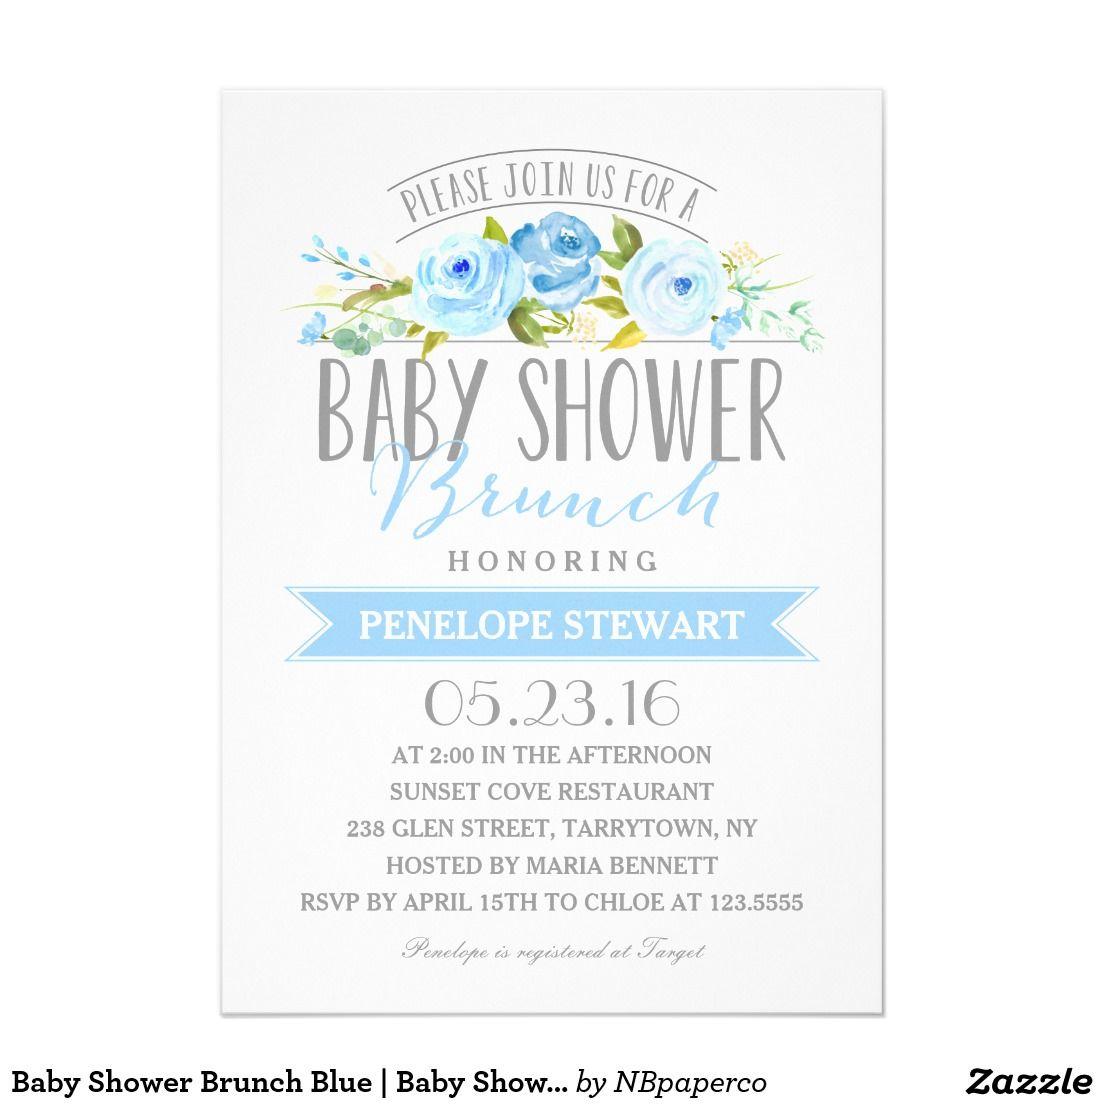 Baby Shower Brunch Blue | Baby Shower Invitation | CELEBRATIONS ...